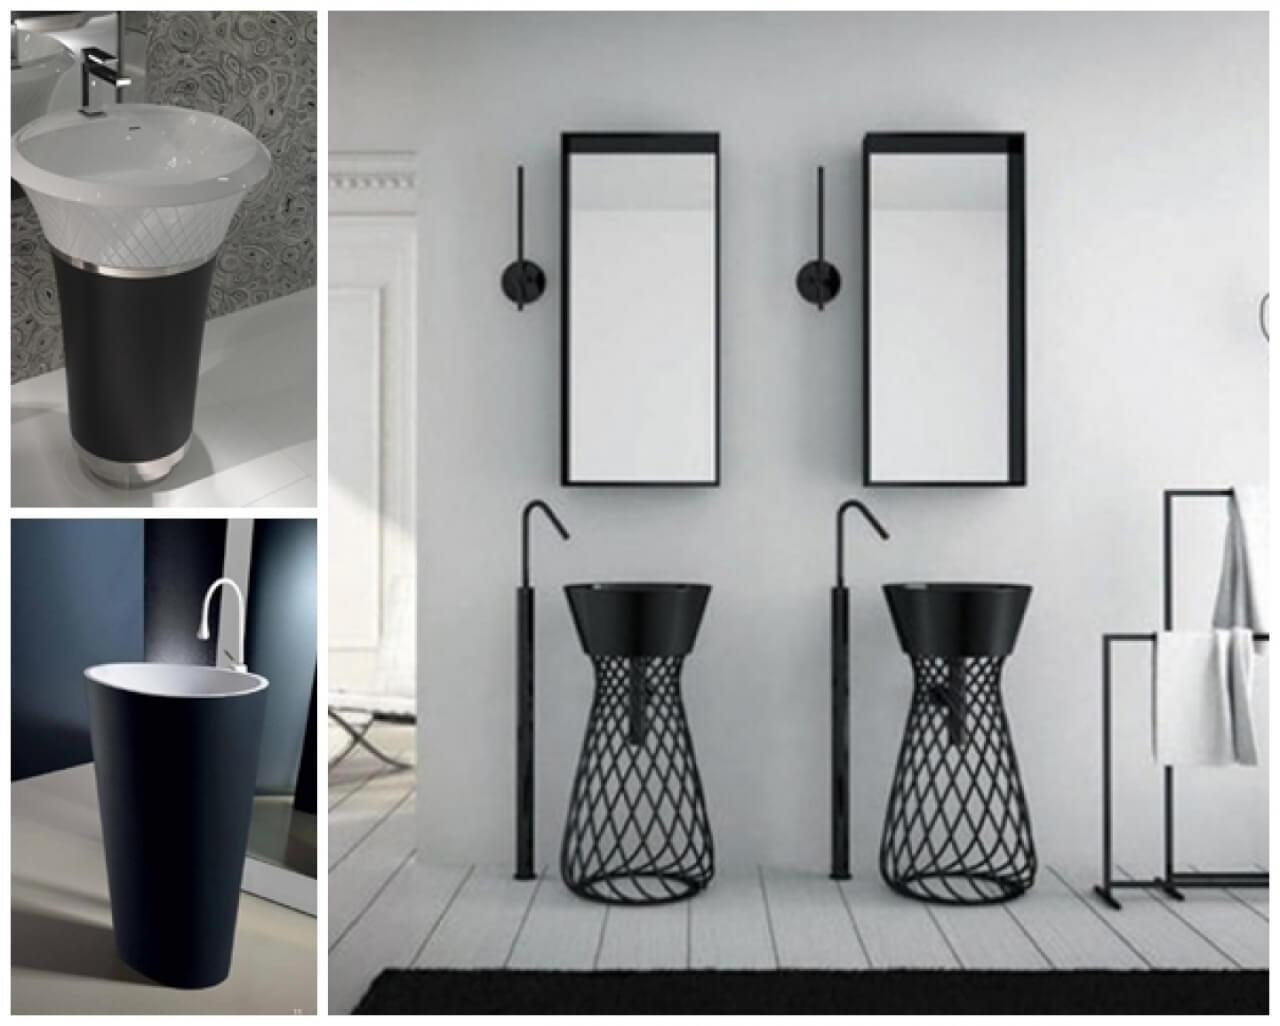 Decorating Ideas In Bathroom Designs With Pedestal Sinks